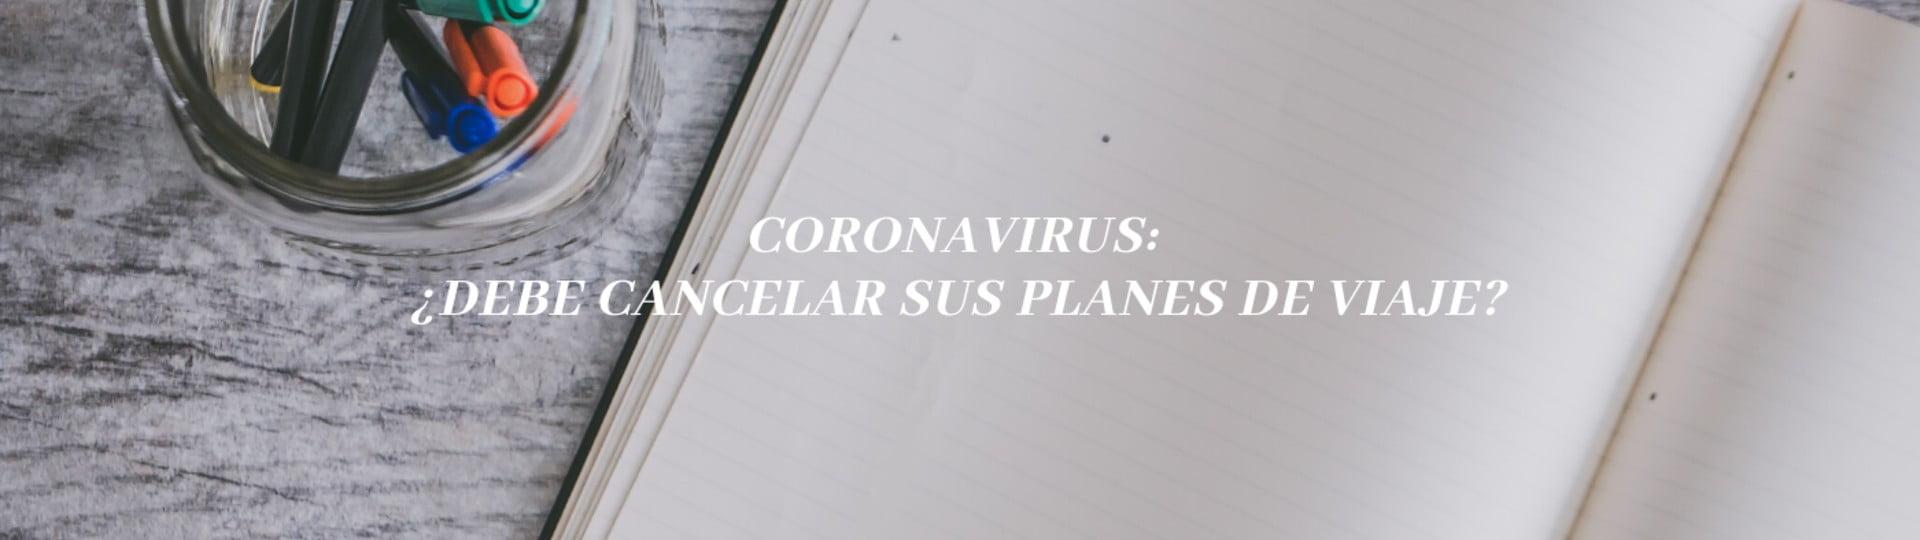 CORONAVIRUS: ¿DEBE CANCELAR SUS PLANES DE VIAJE?